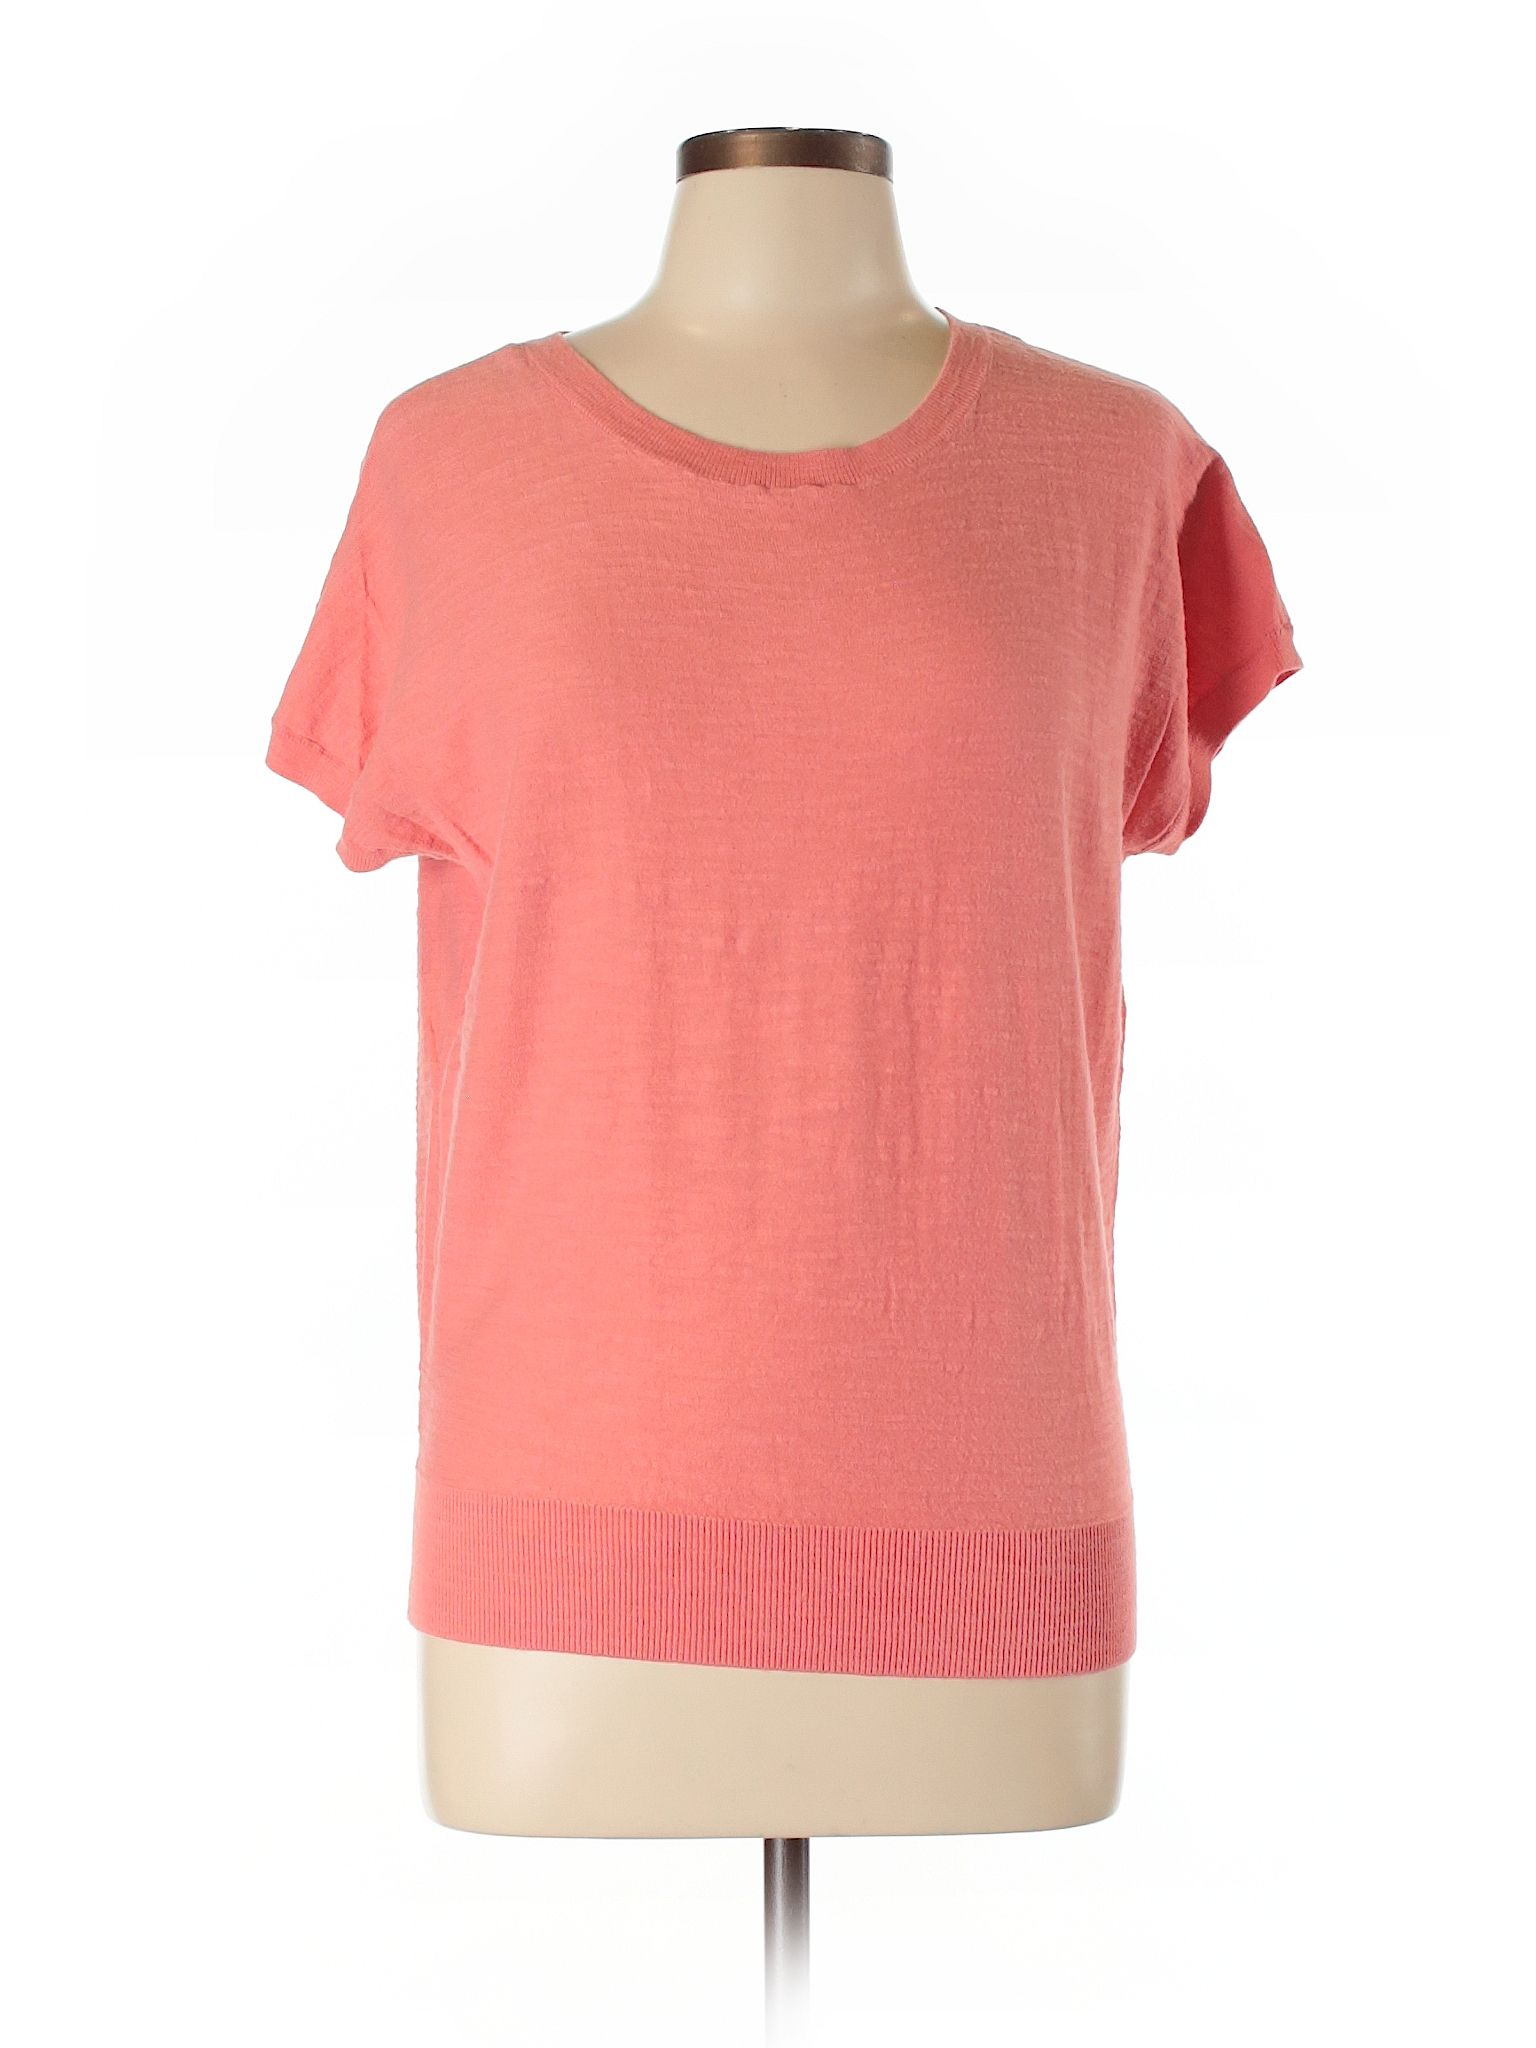 Ann Taylor Loft Outlet Short Sleeve T Shirt Size 1200